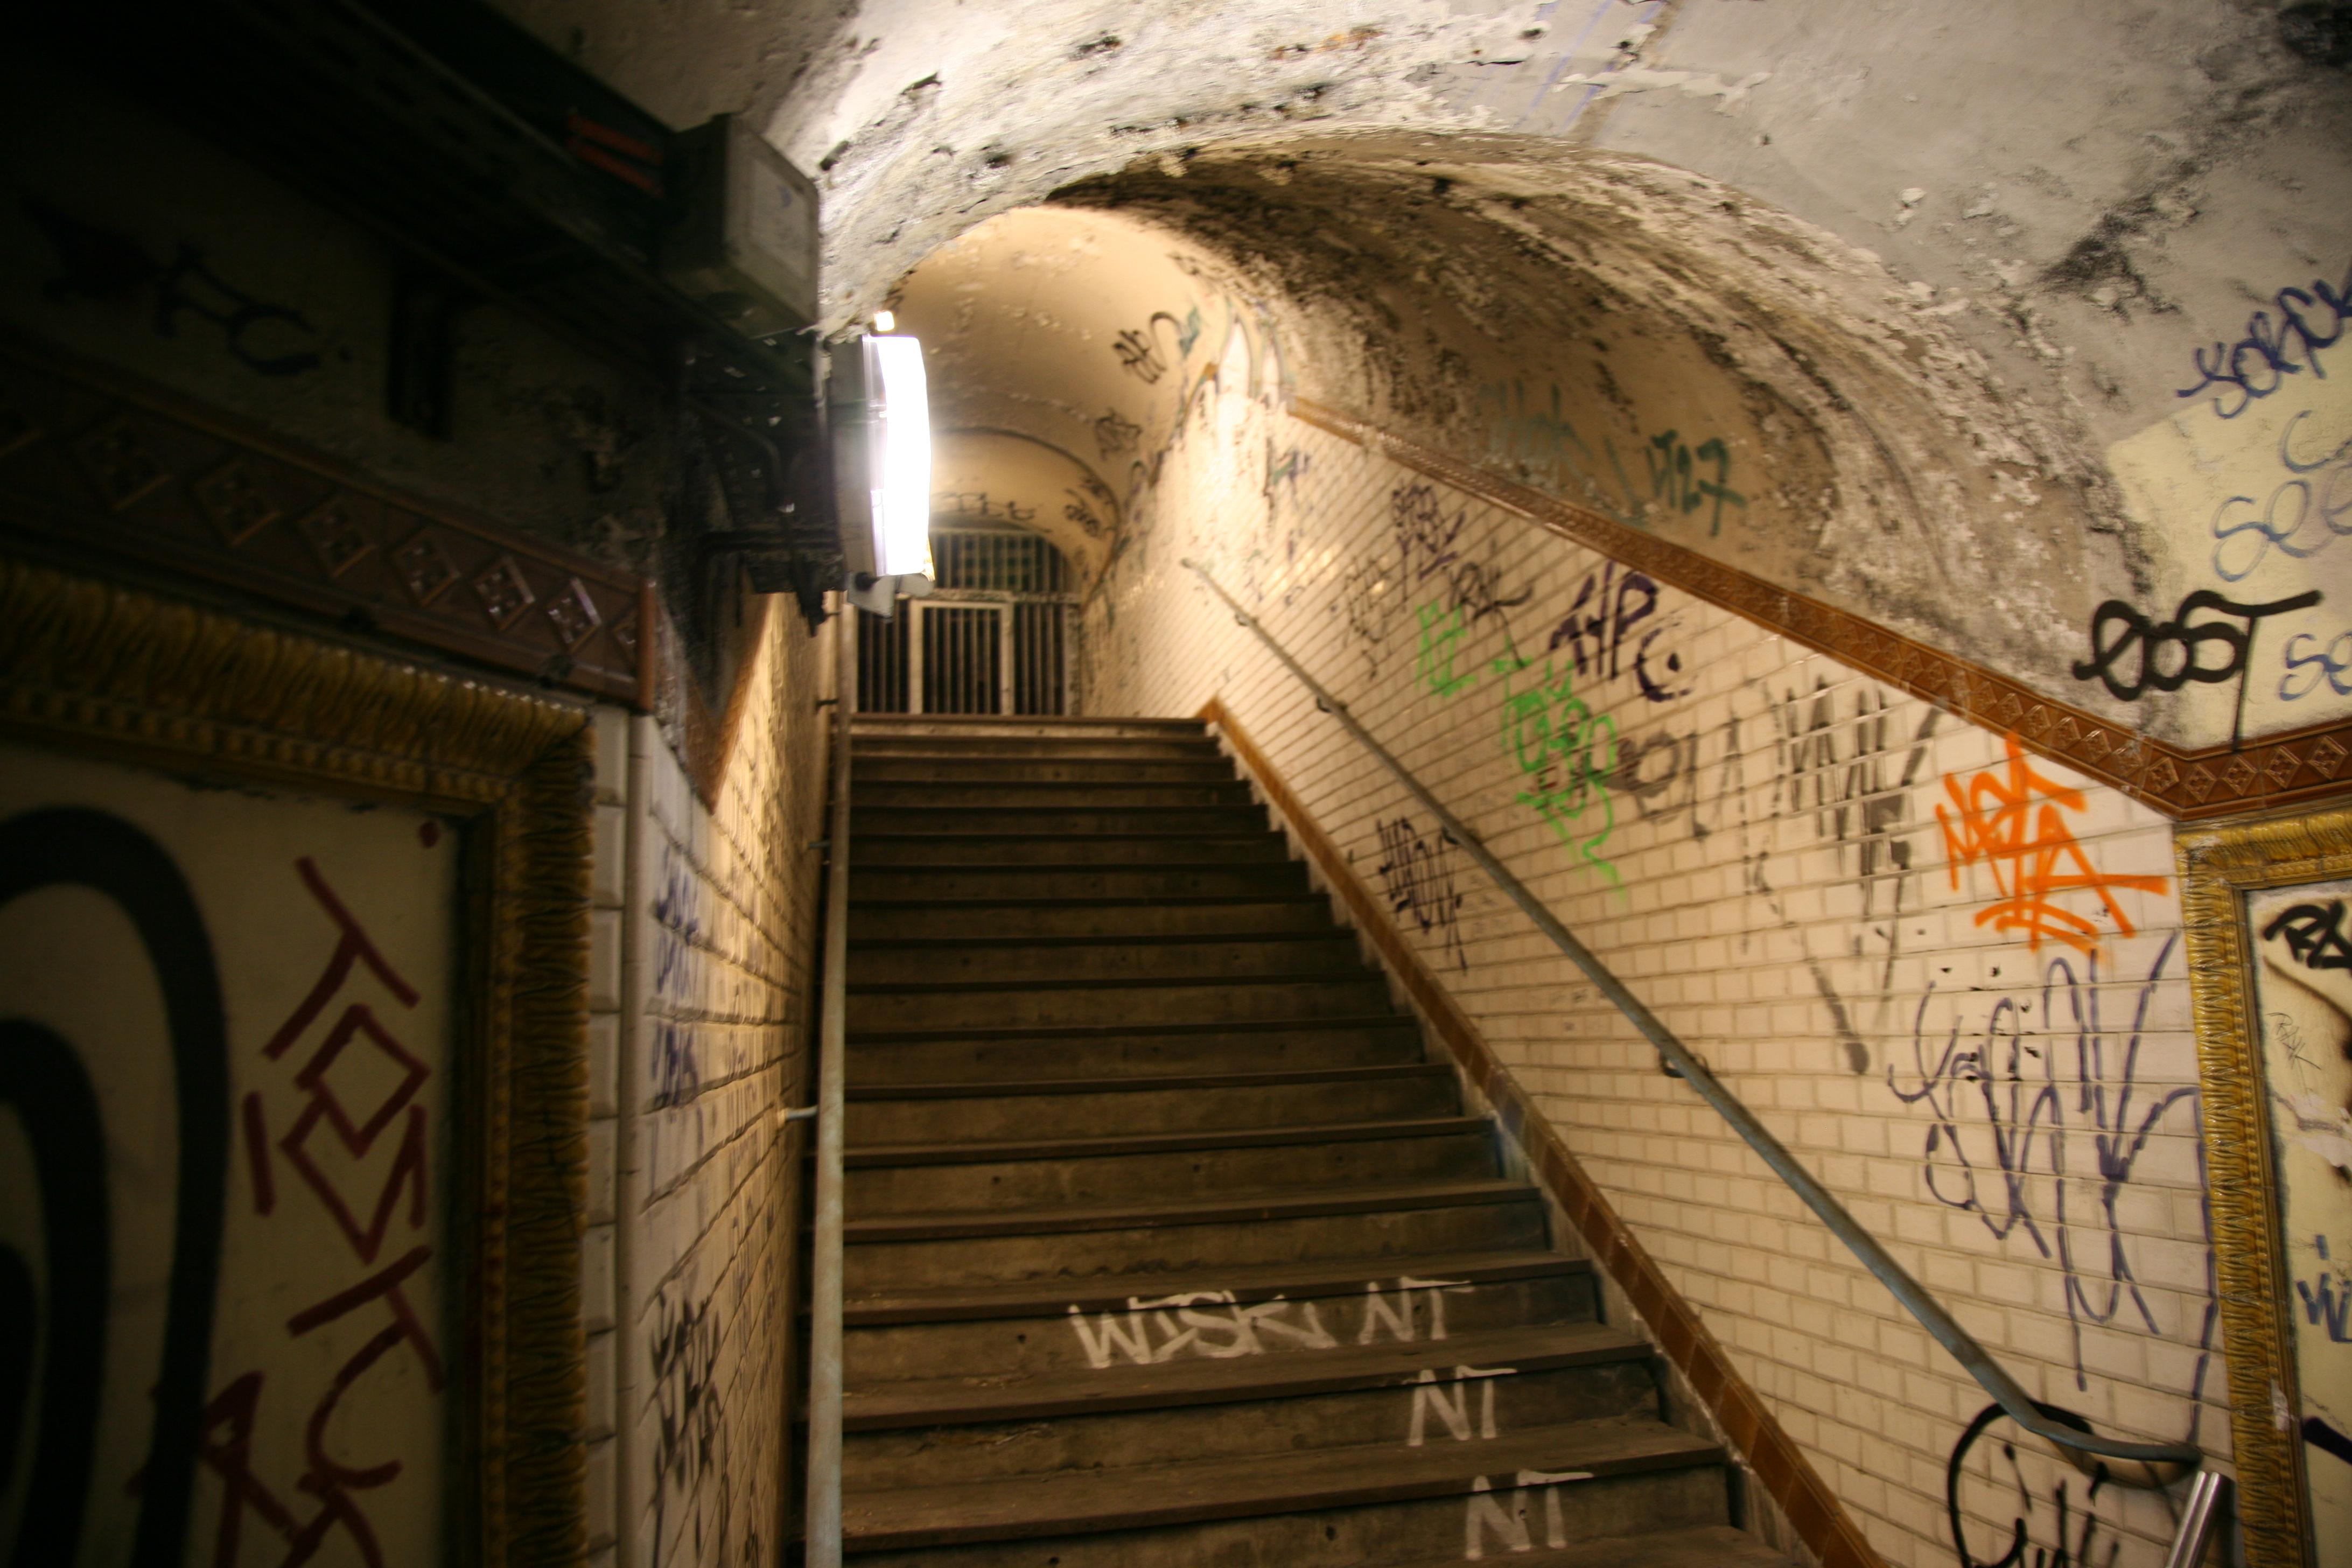 Le Treppenaufgang file ratp station croix installation x lenfer